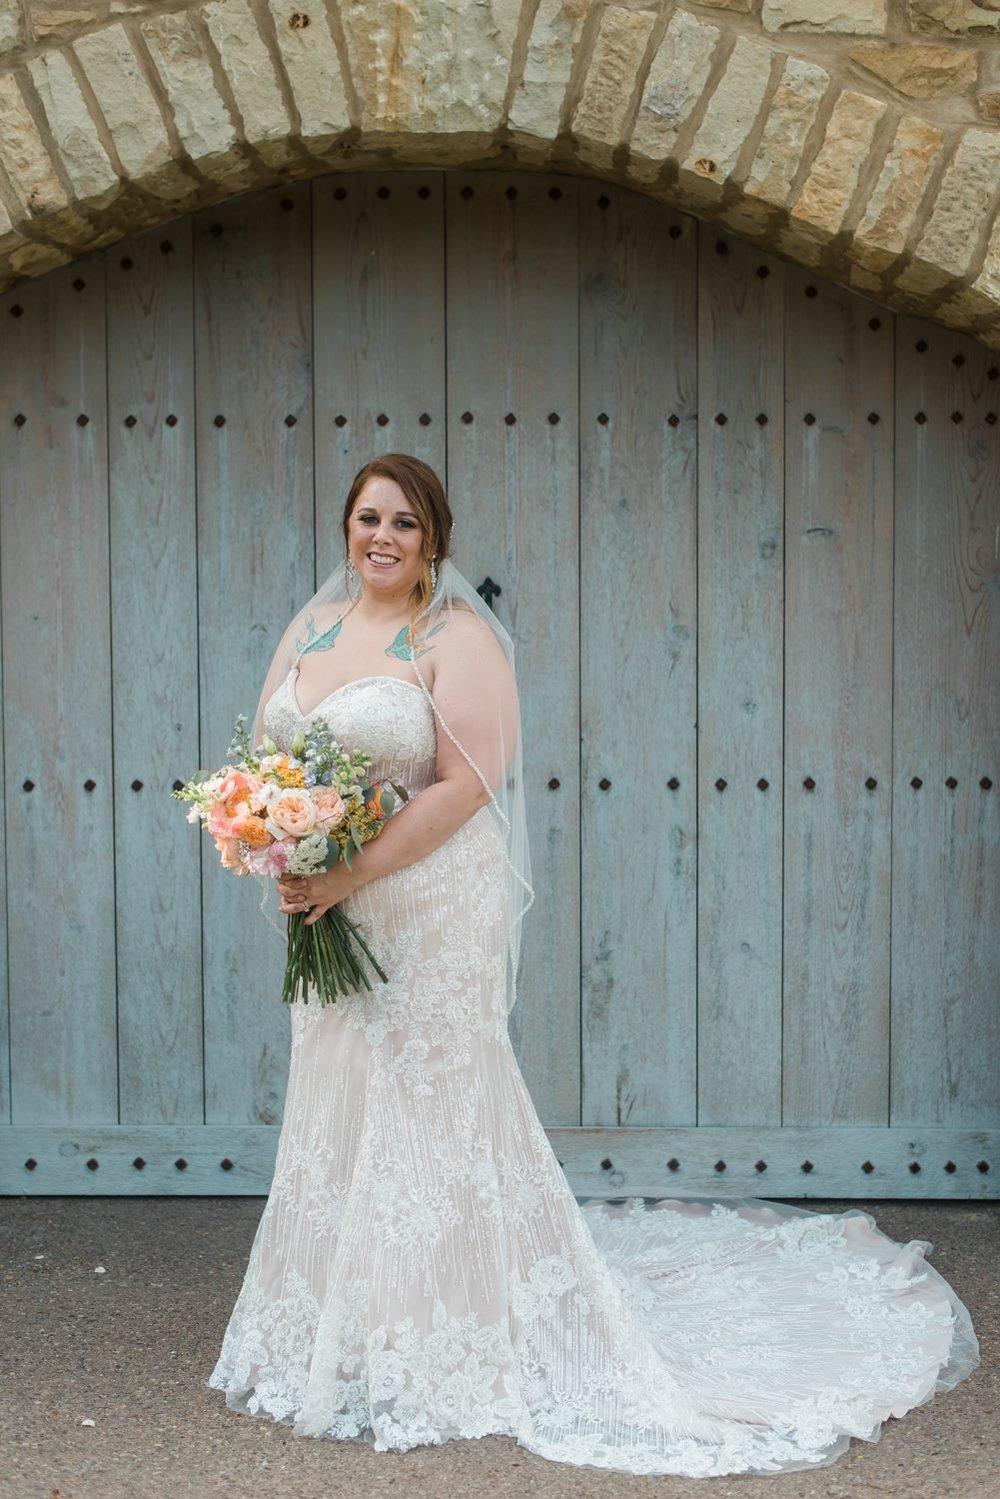 pittsburgh-botanic-garden-wedding-rustic-romantic-pennsylvania-0015.jpg